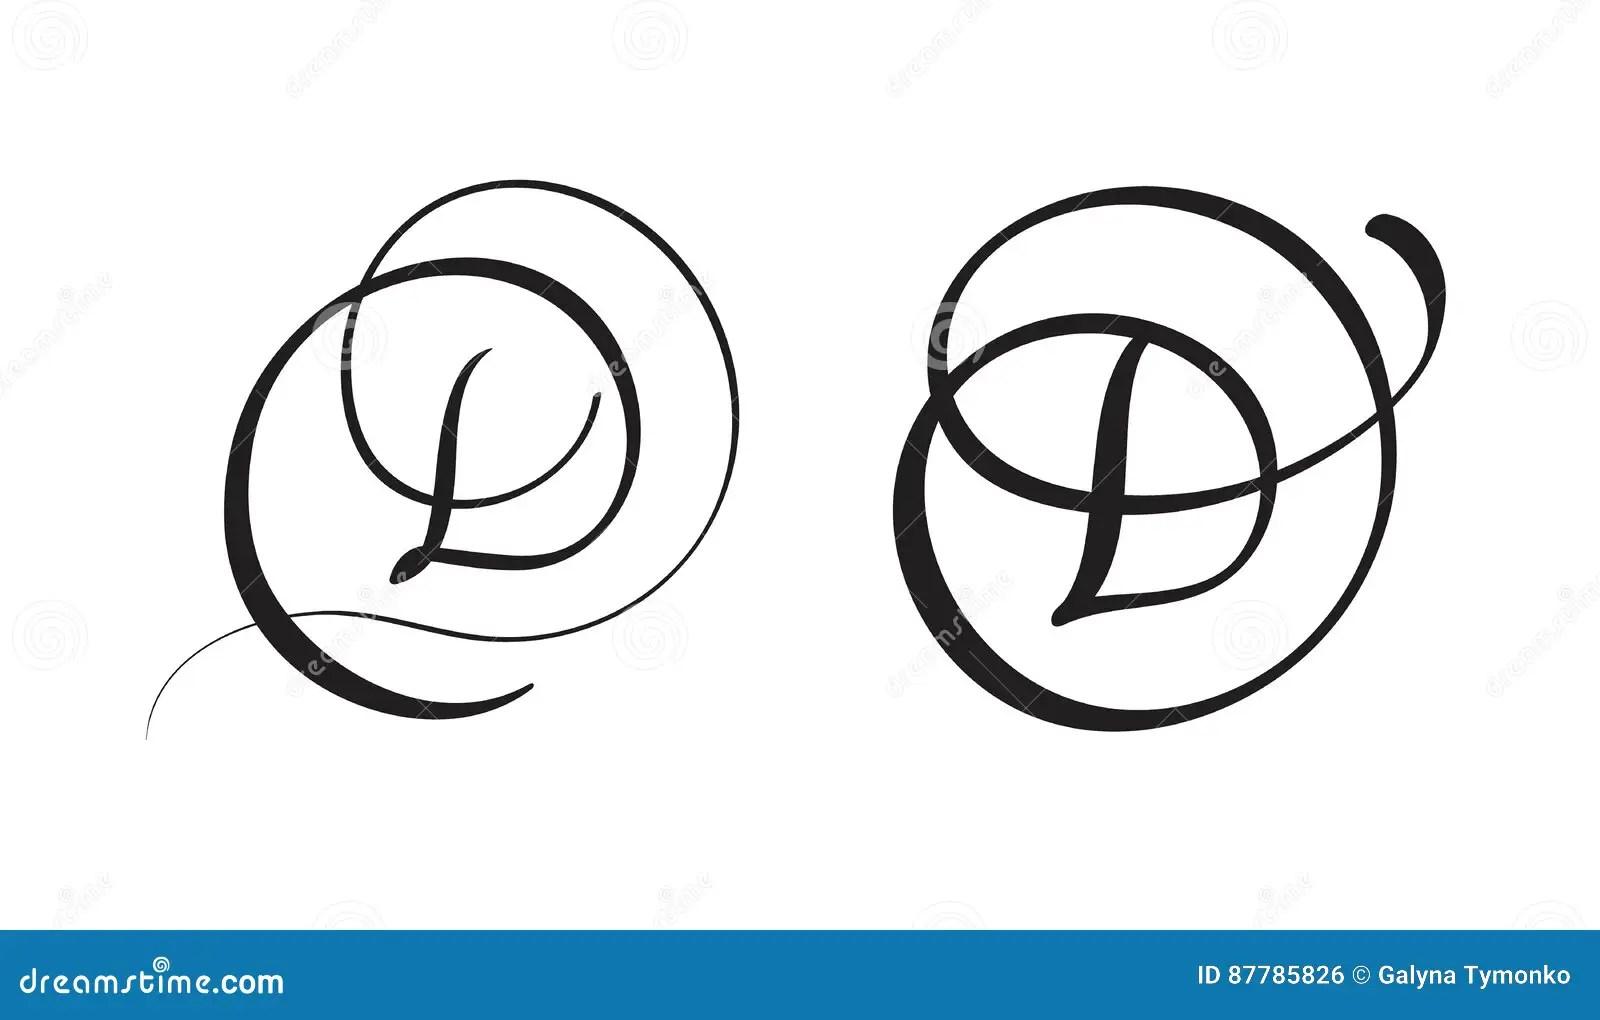 i d letter